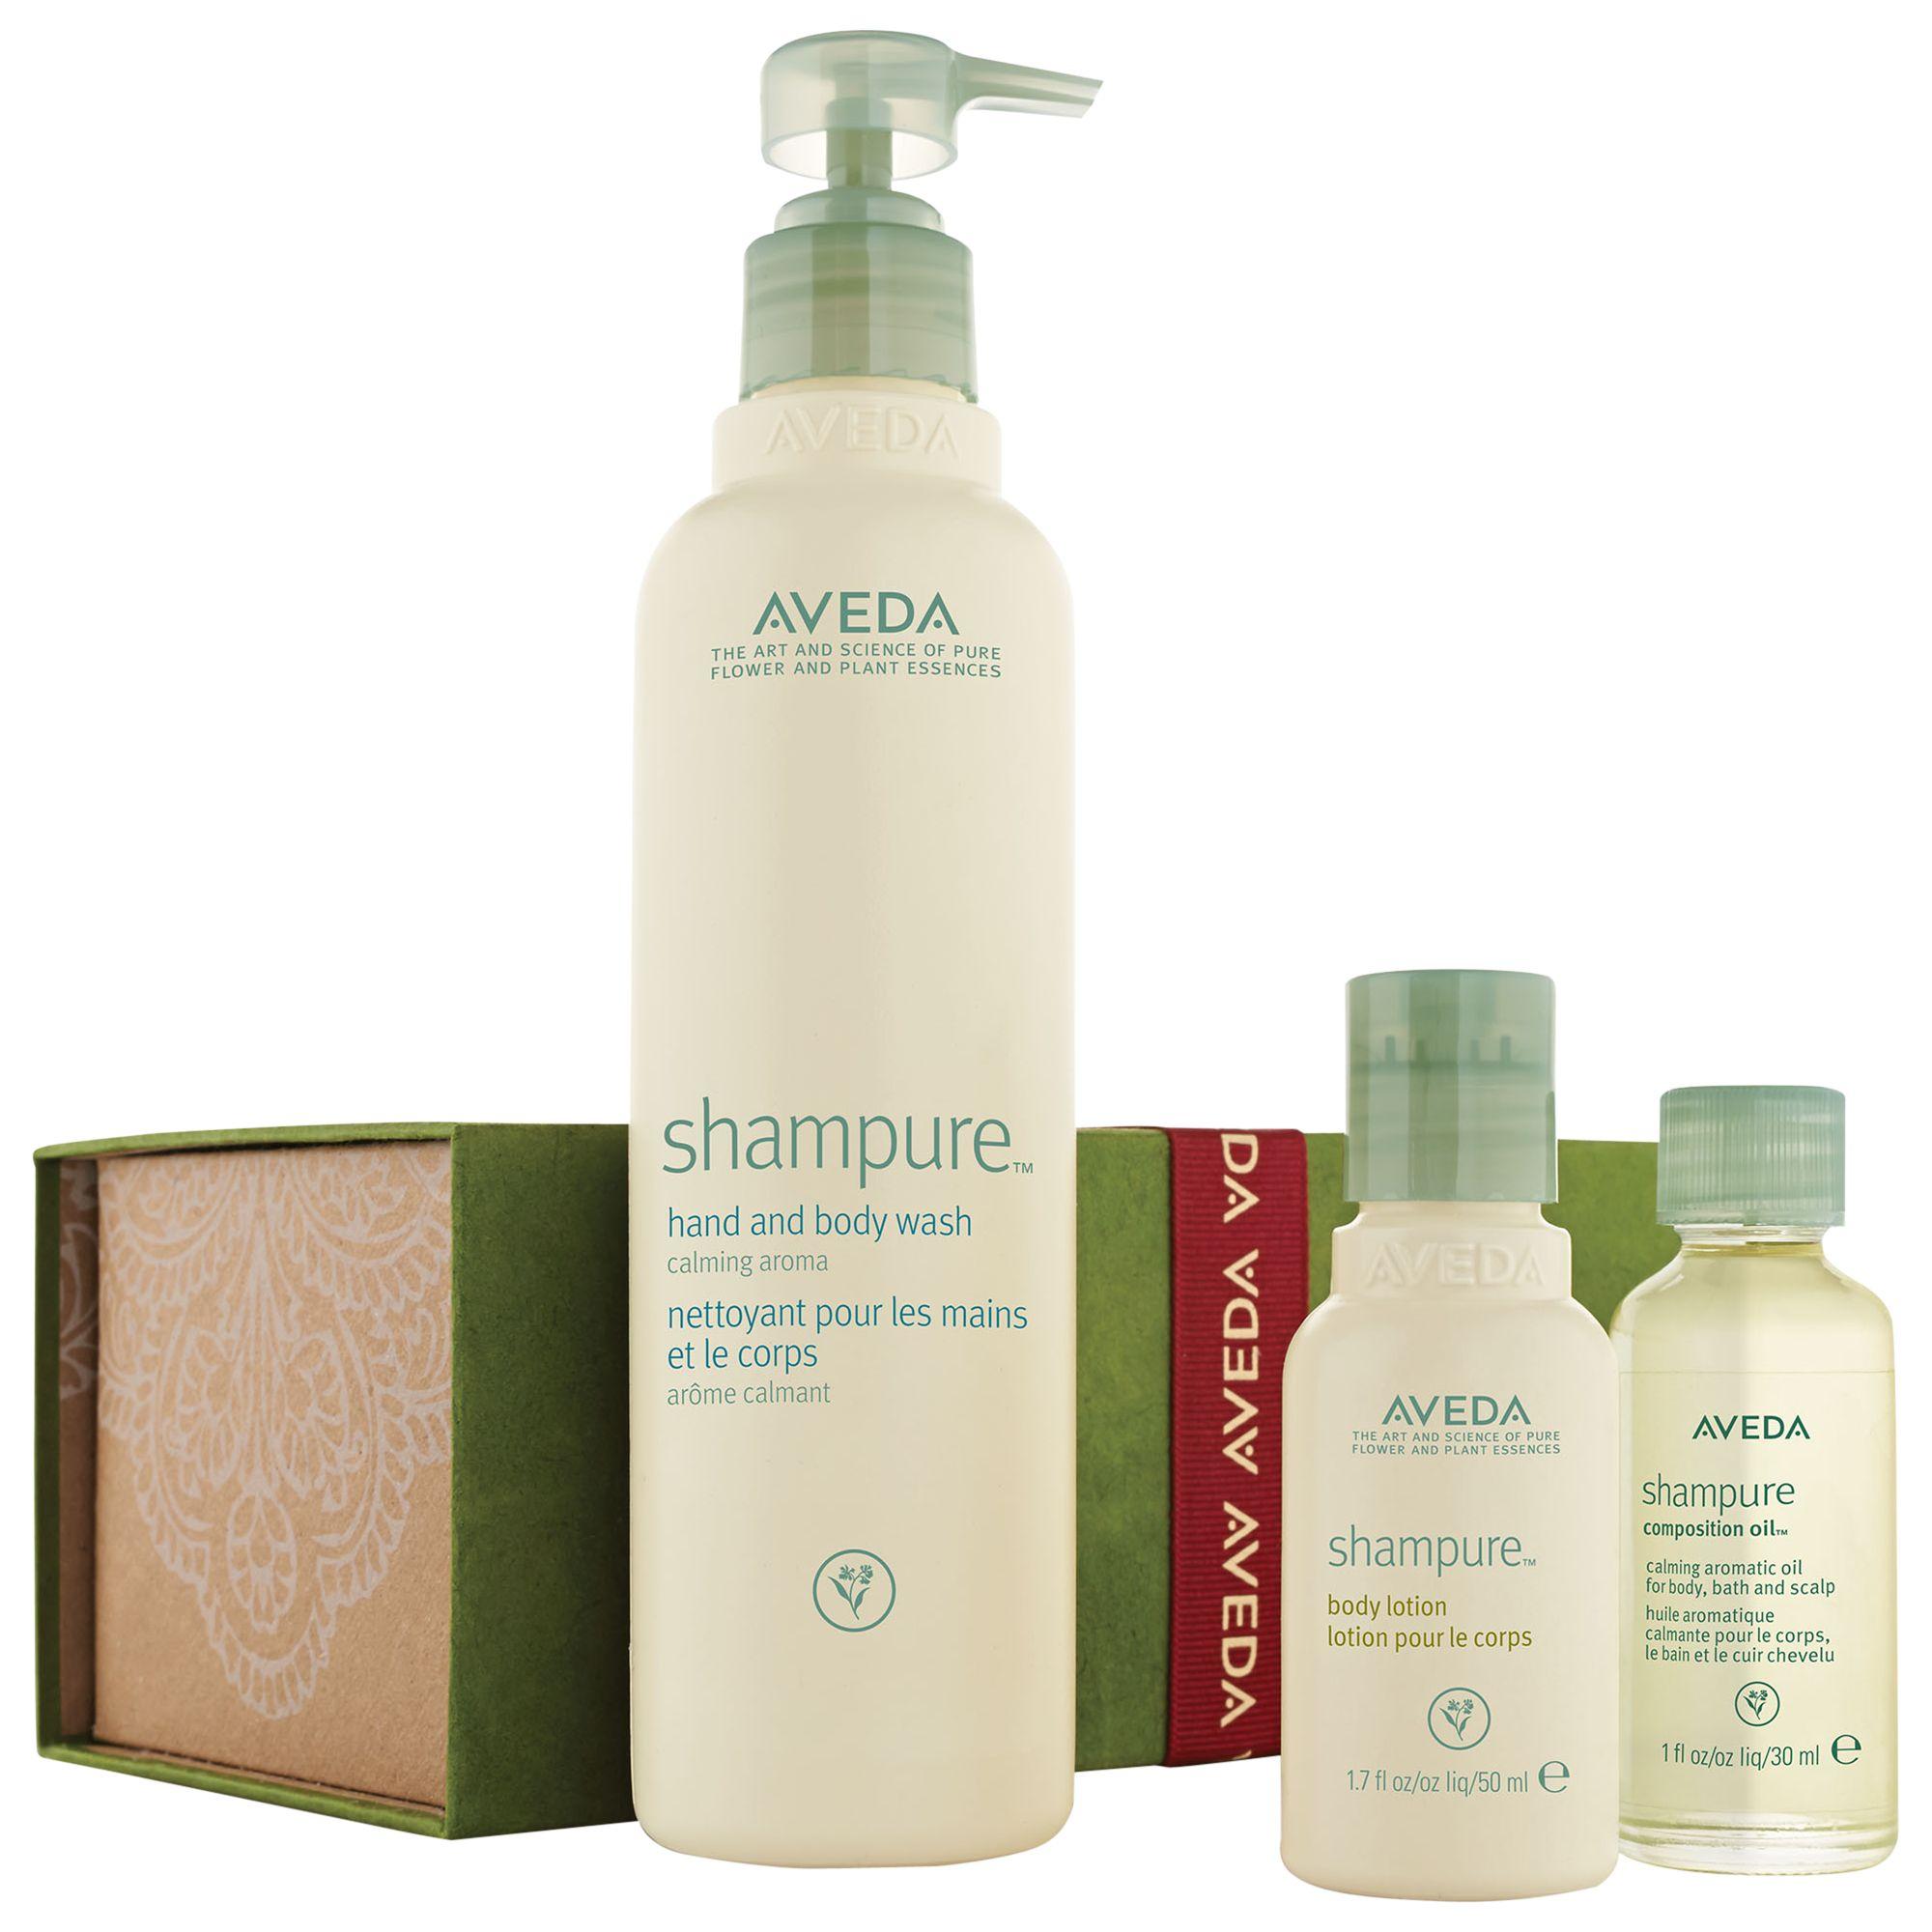 AVEDA AVEDA Shampure Body Skincare Gift Set